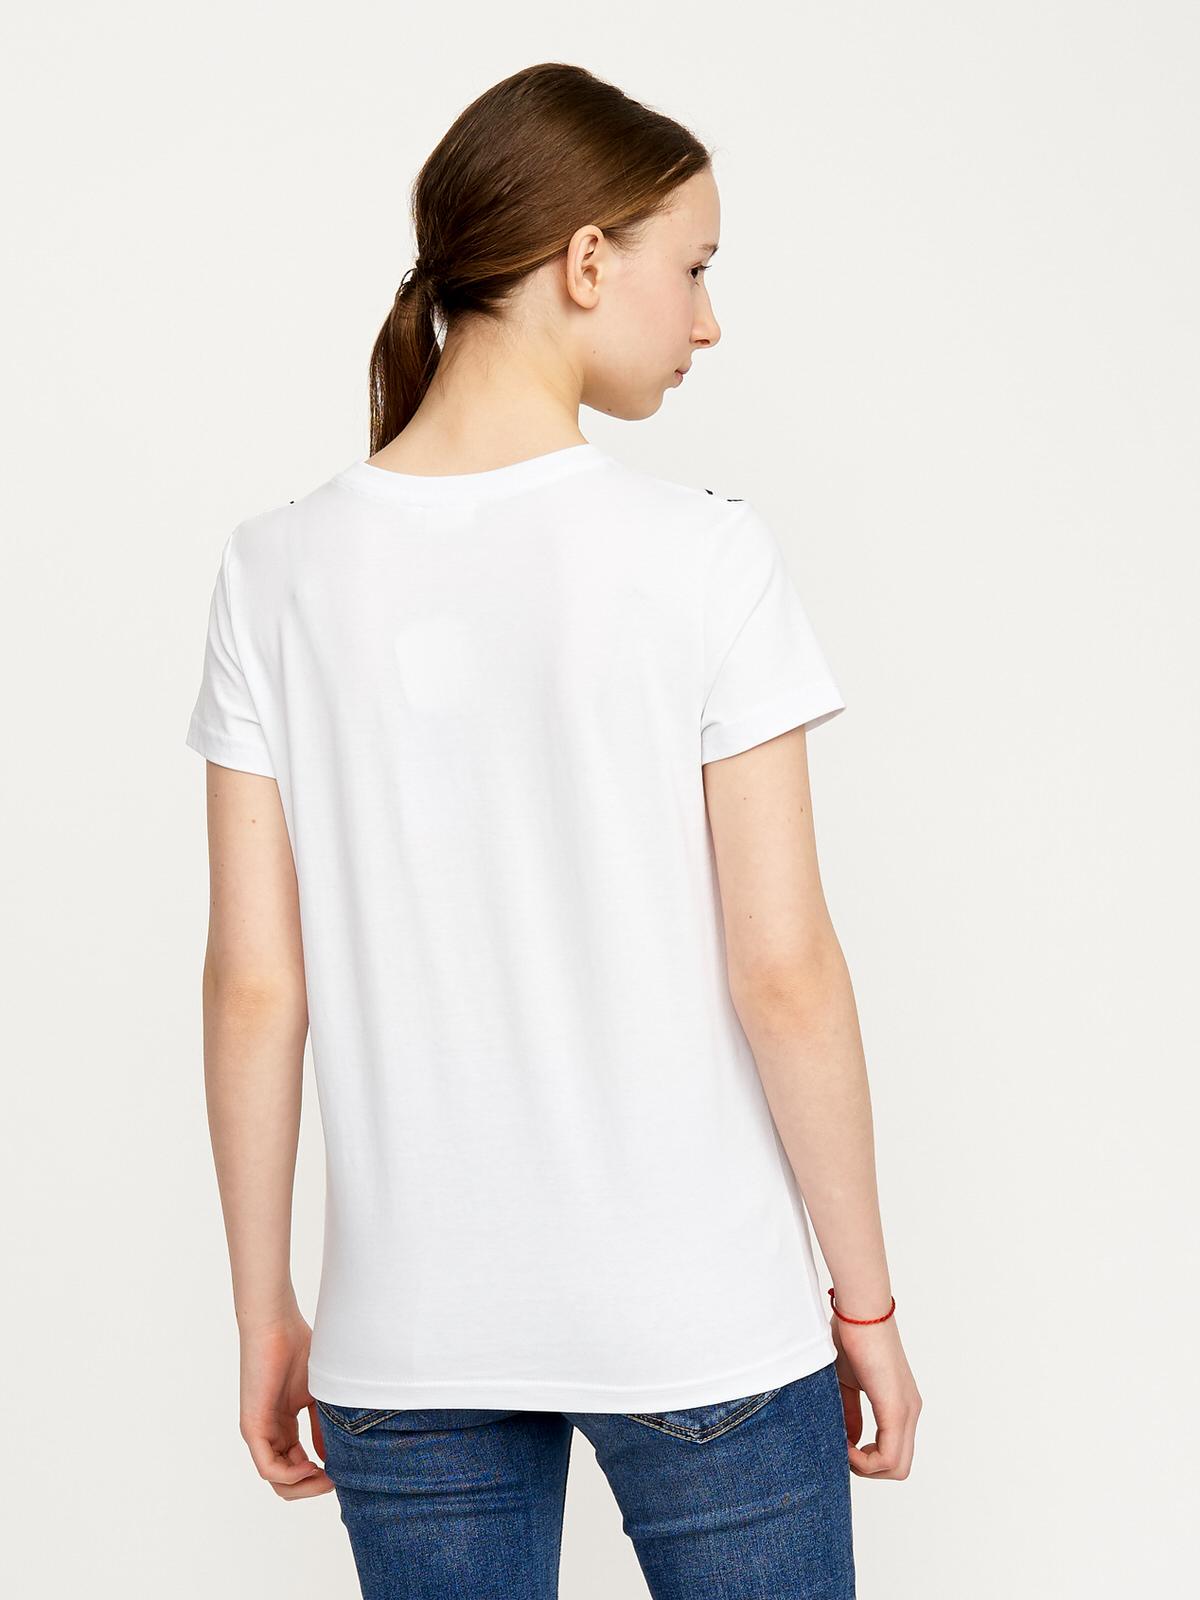 Dívčí tričko Graphics Bílá